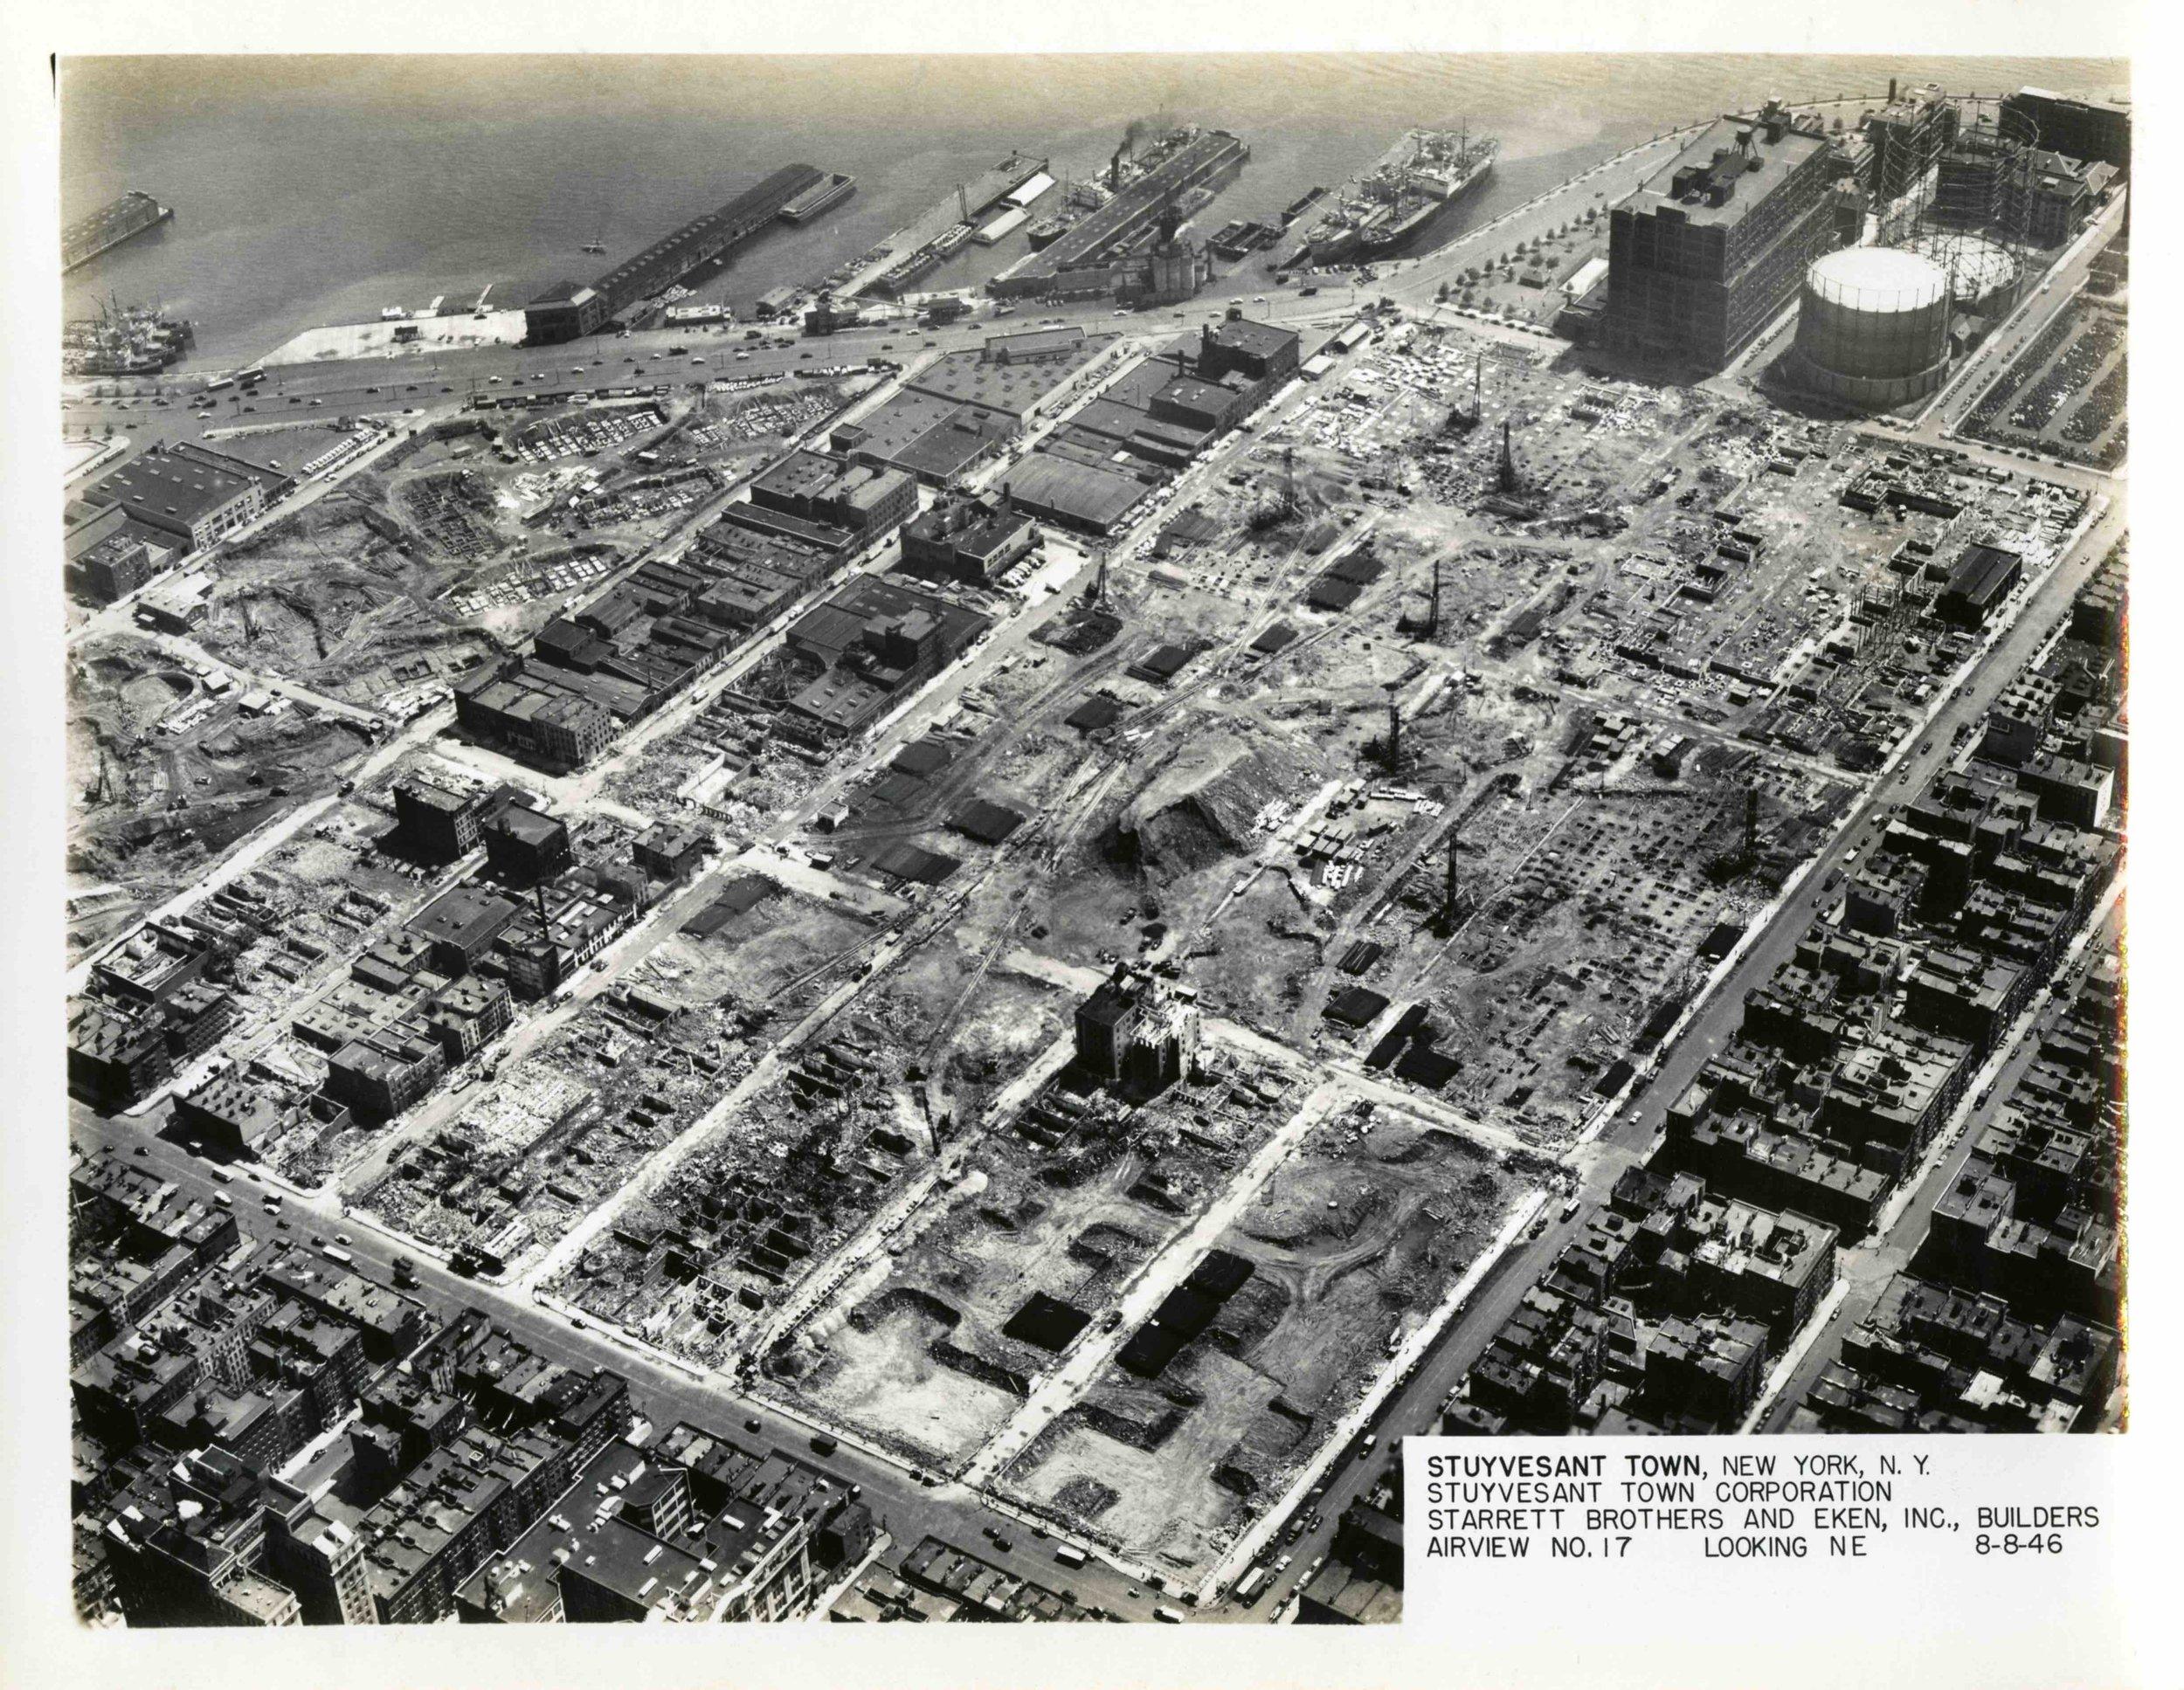 S17-August 8, 1946, Stuyvesant Town Aerials, Looking North East.jpeg